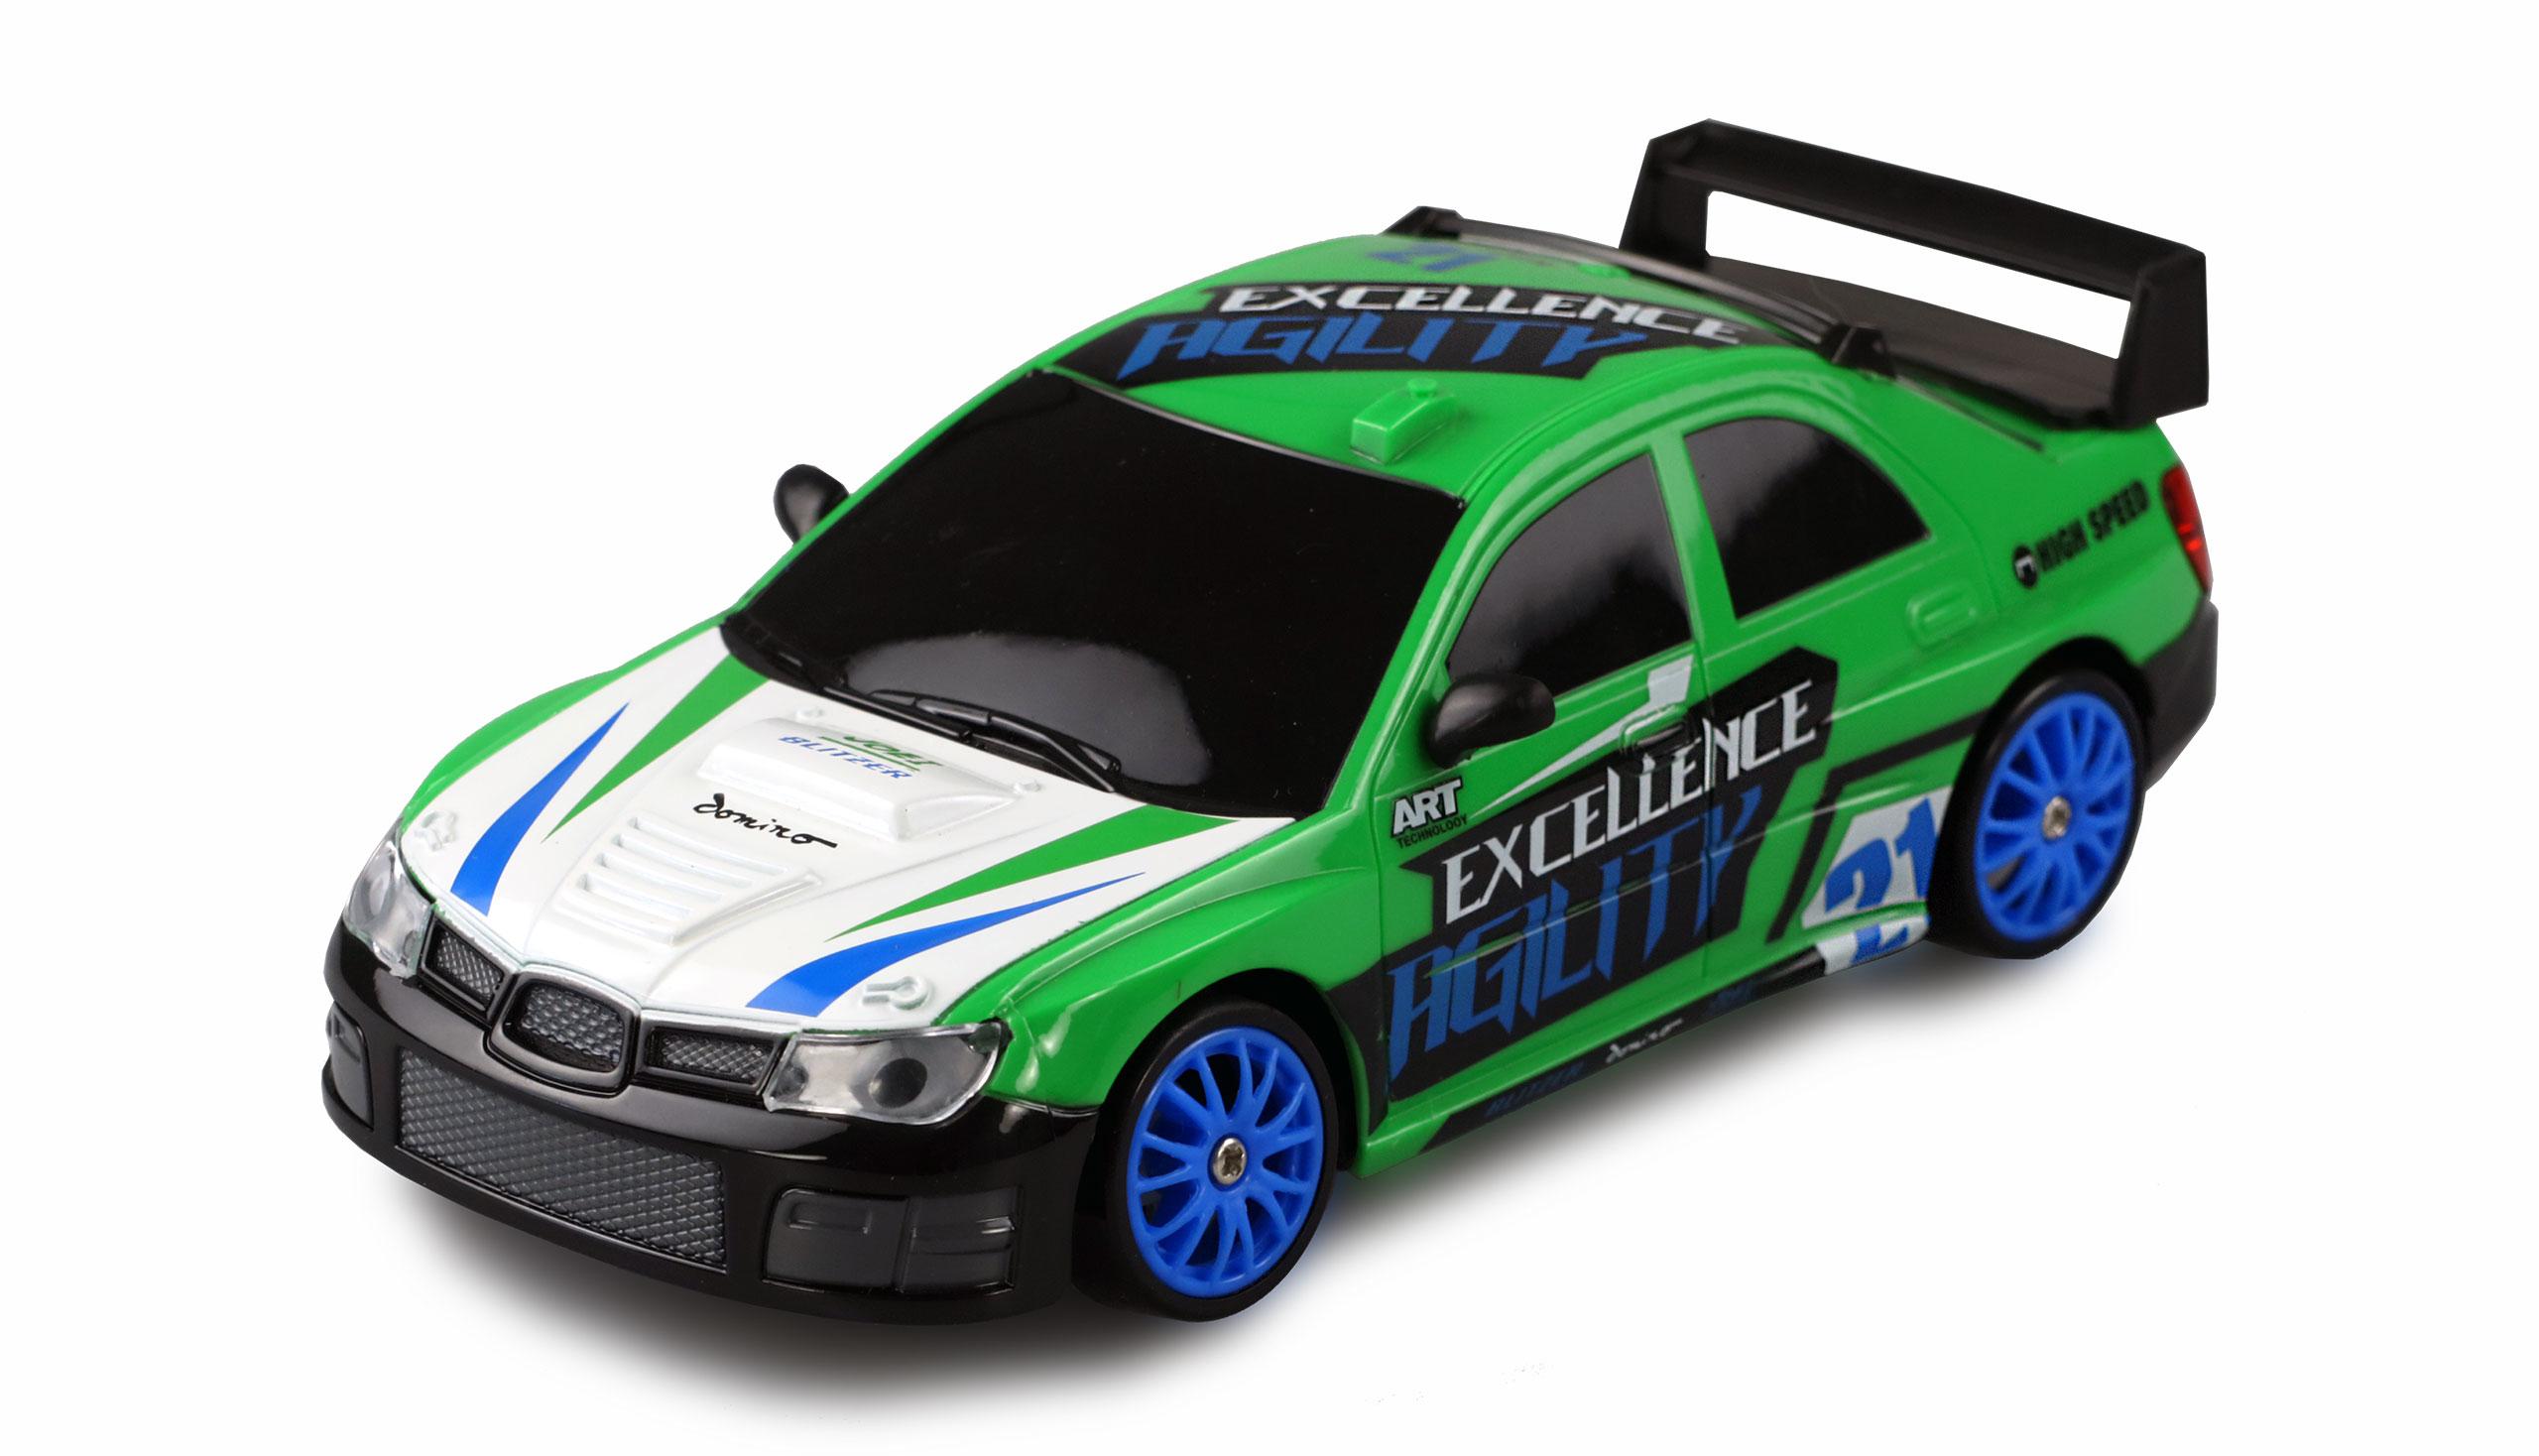 Amewi Drift Sport Car 1 24 gruen 4WD 2.4 GHz Fernsteuerung